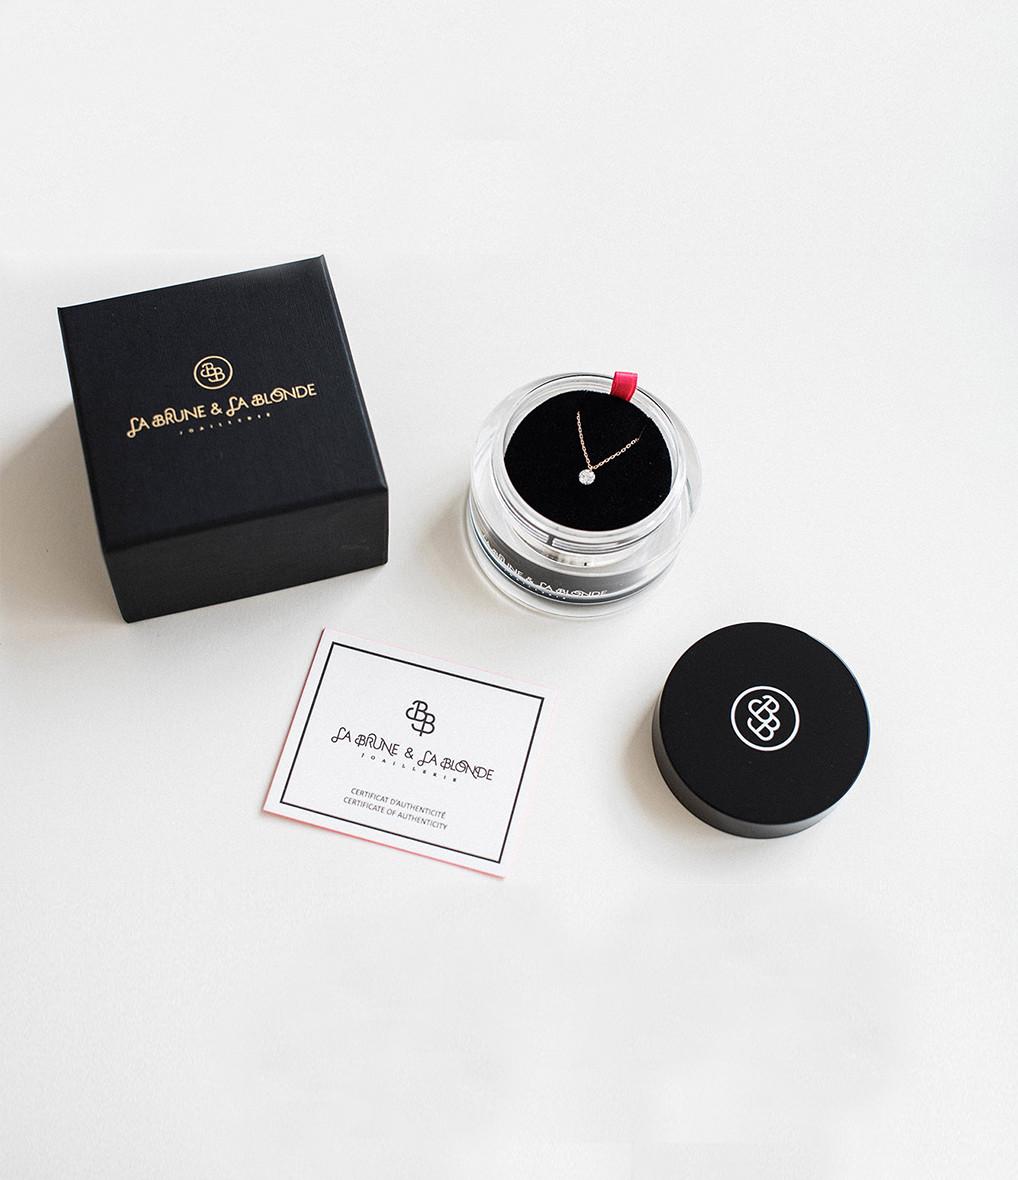 LA BRUNE & LA BLONDE - Créoles Confetti Rubis Or Rose